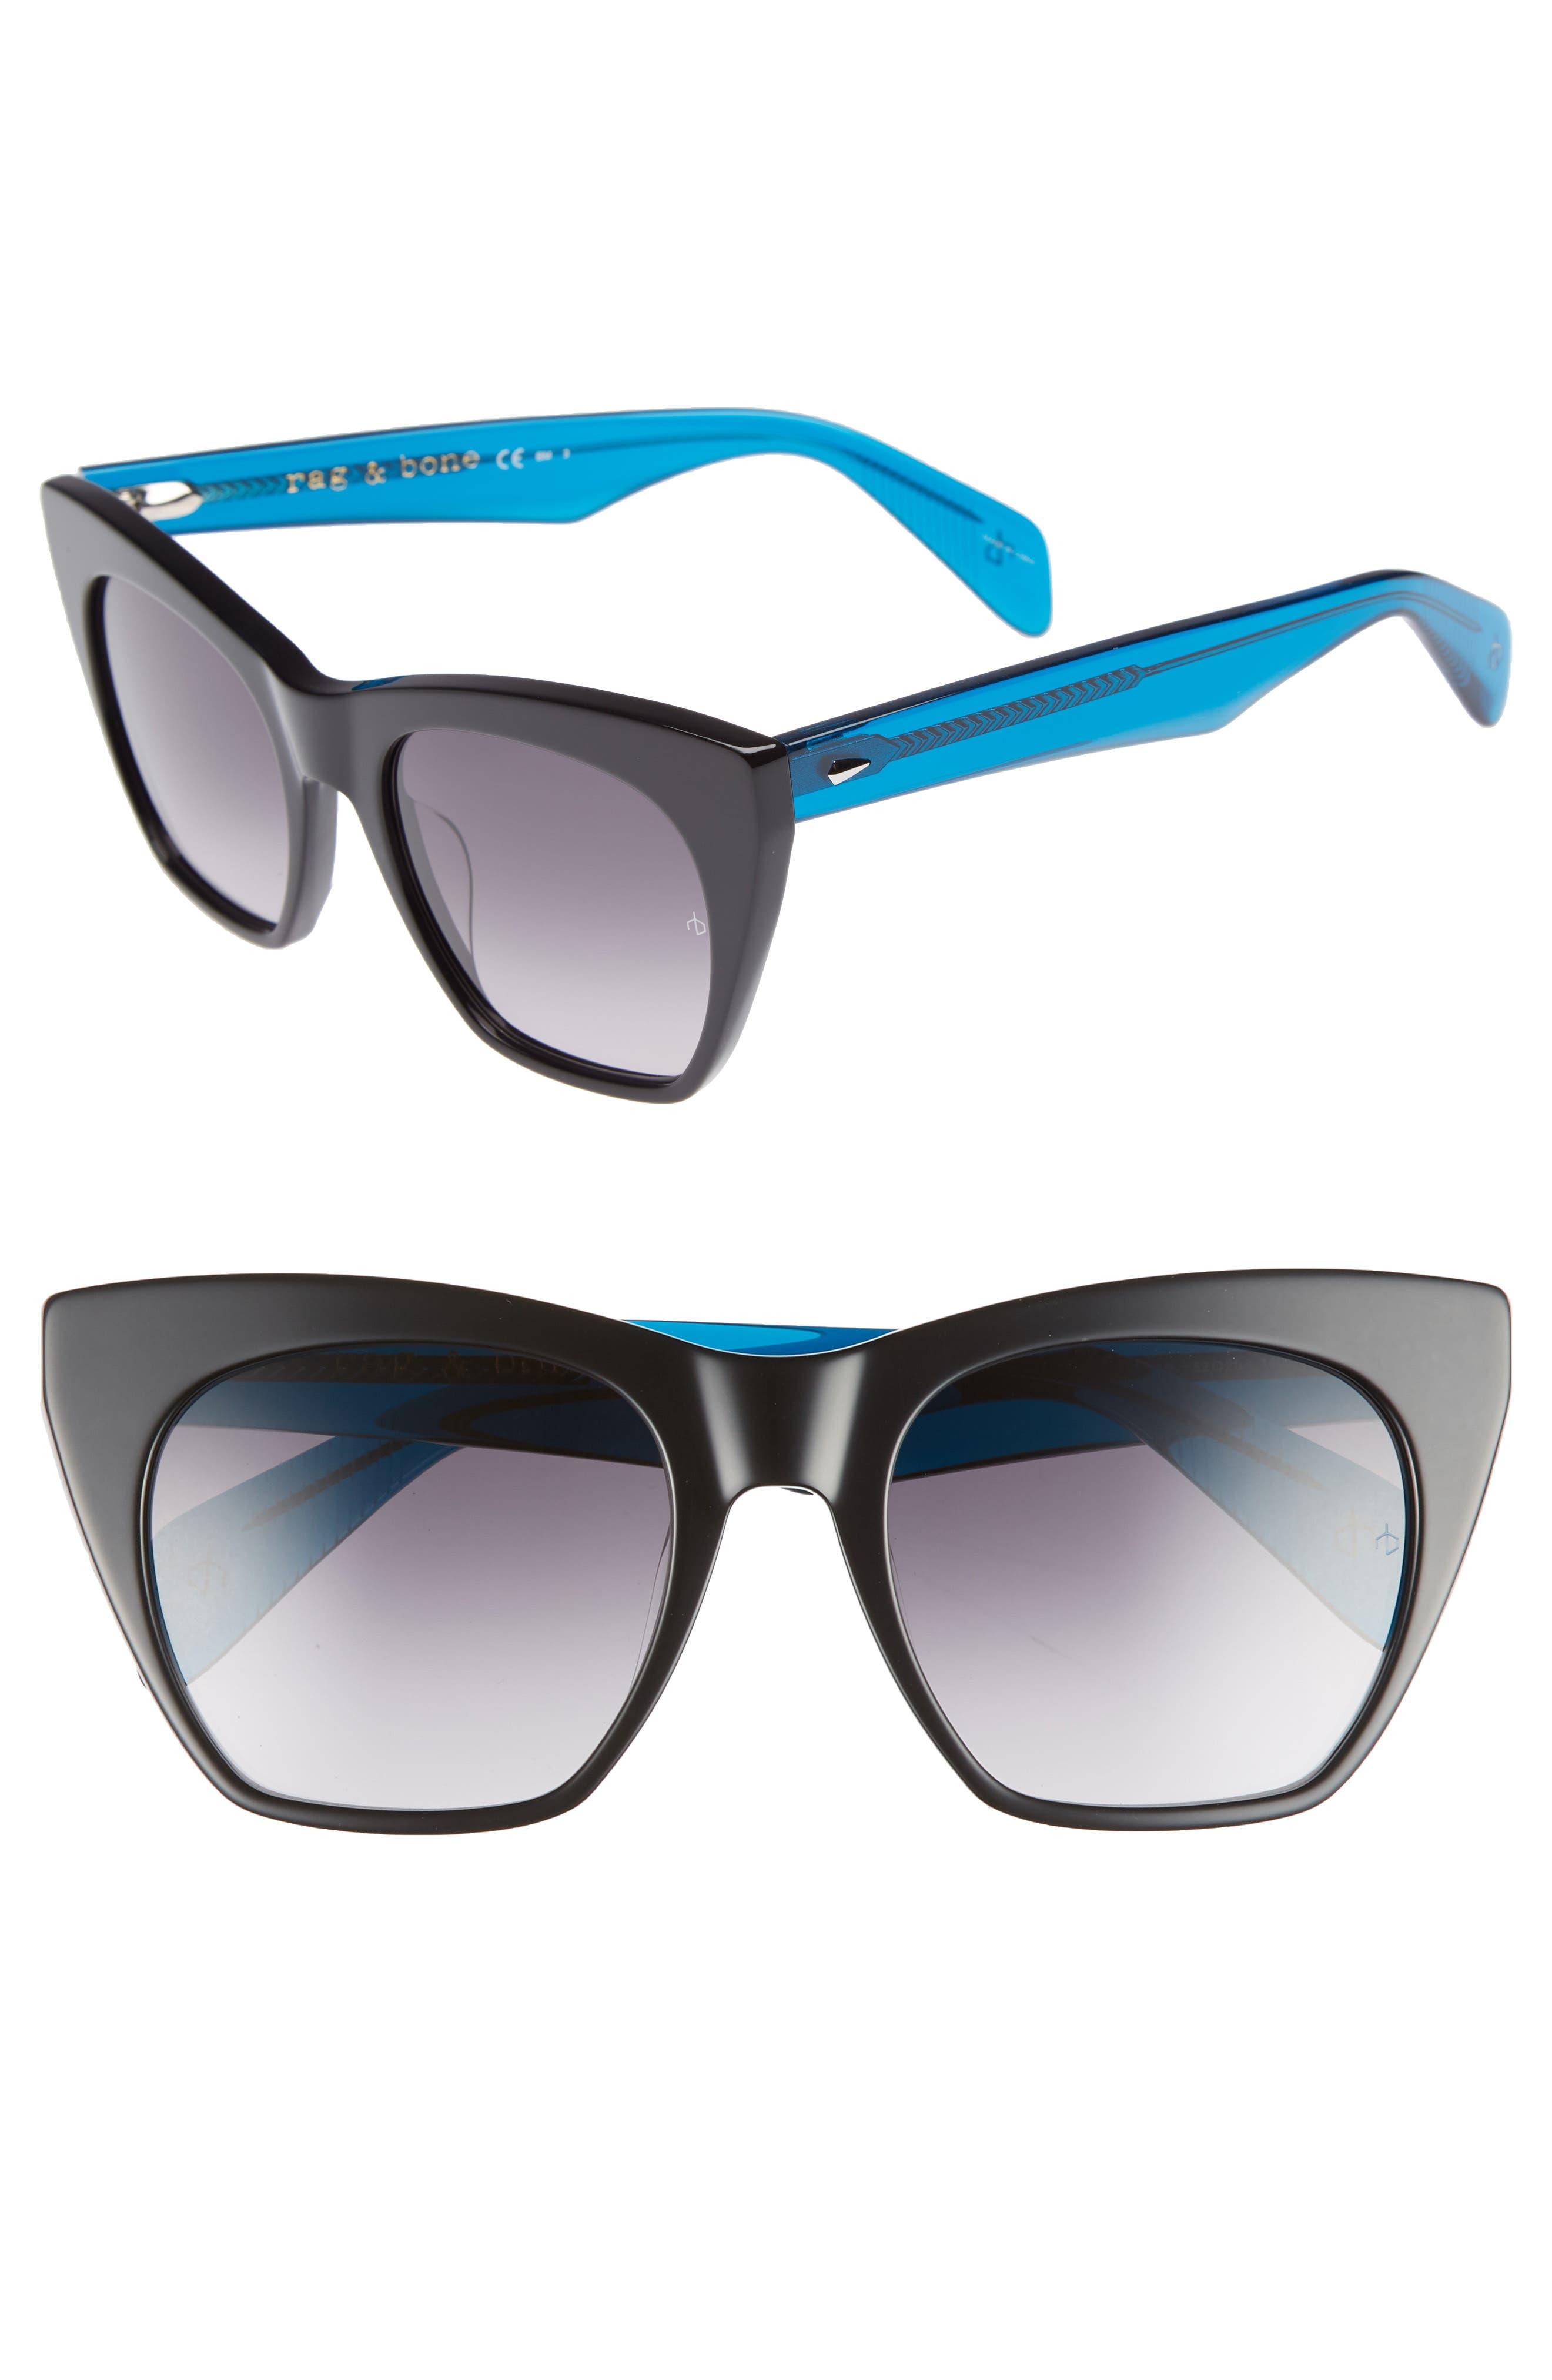 52mm Cat Eye Sunglasses,                             Main thumbnail 1, color,                             BLACK/ BLUE